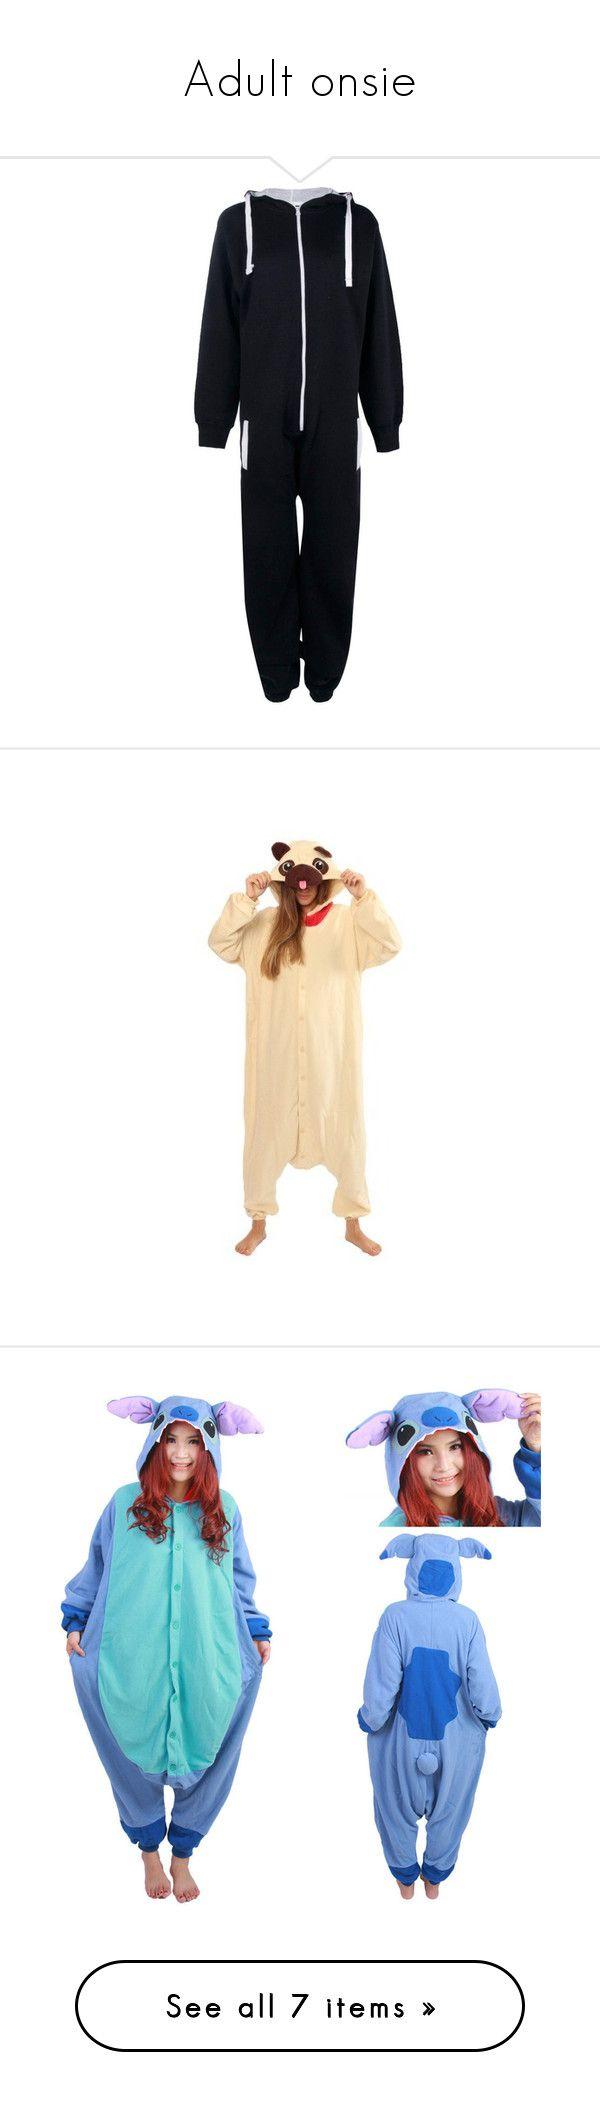 """Adult onsie"" by masmas21 ❤ liked on Polyvore featuring costumes, adult halloween costumes, adult costumes, kigurumi costume, stitch costume, role play costumes, adult stitch costume, intimates, sleepwear and pajamas"